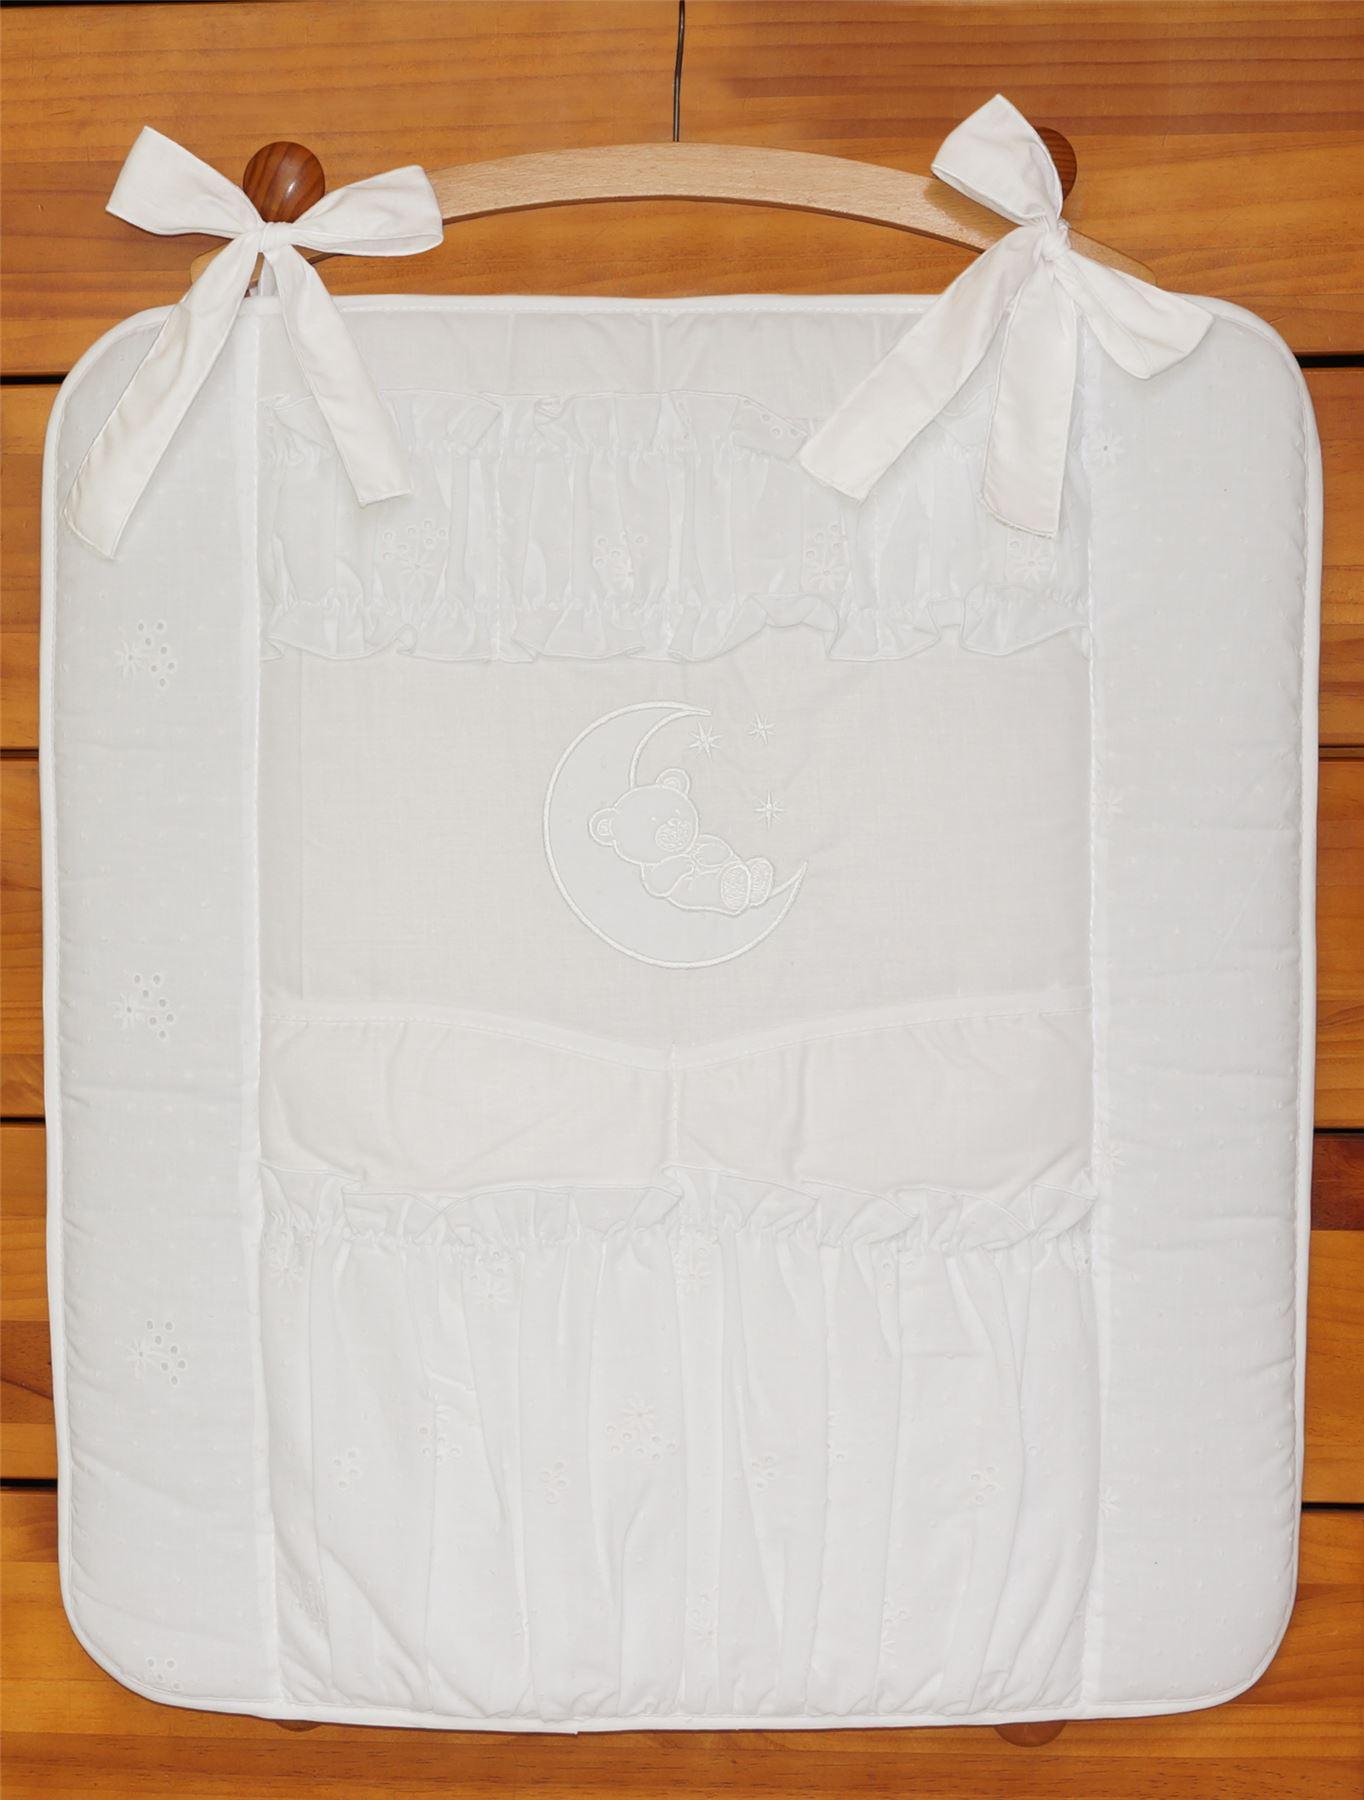 Cuna-Ordenado-ORGANIZADOR-4-Pockets-Match-Guarderia-Bebe-Cama-Ropa-de-Moon